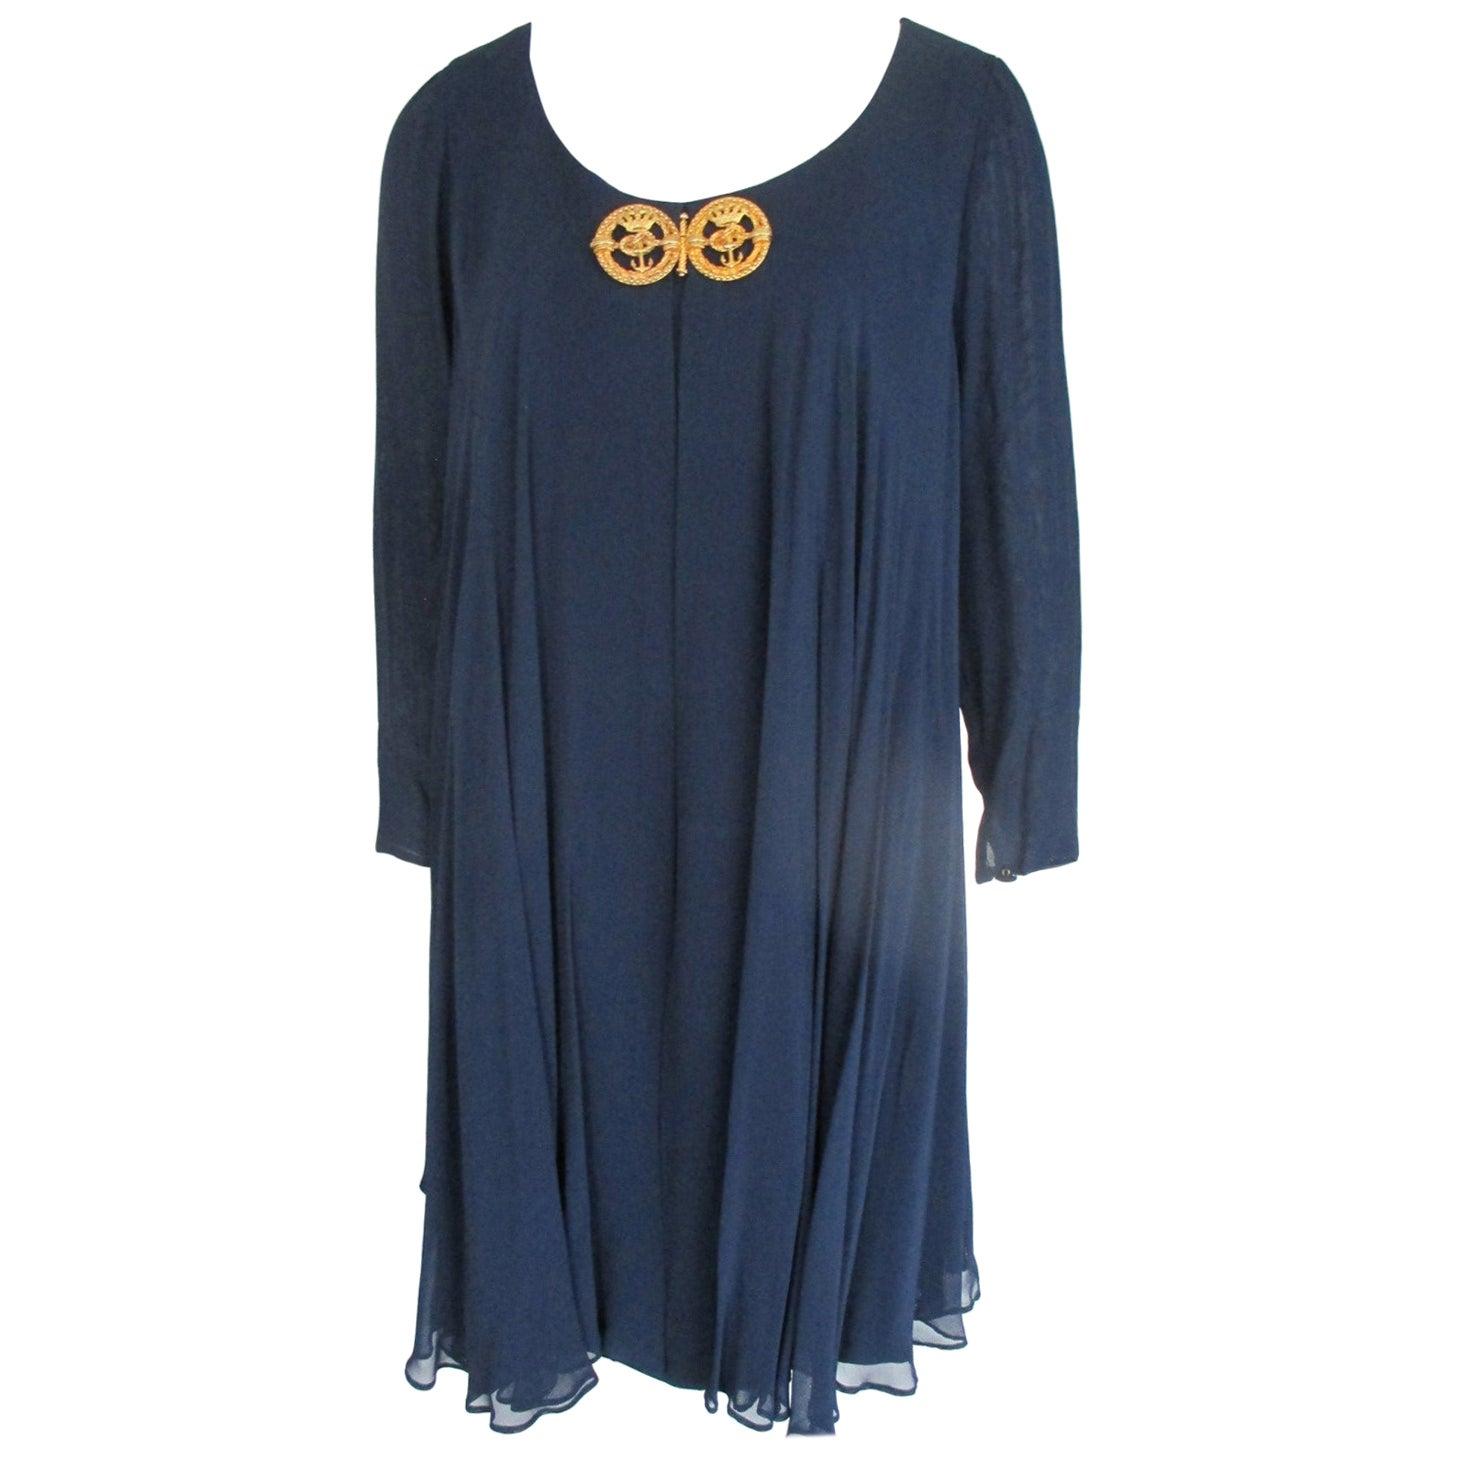 Blue Cocktail Dress Nina Ricci Paris